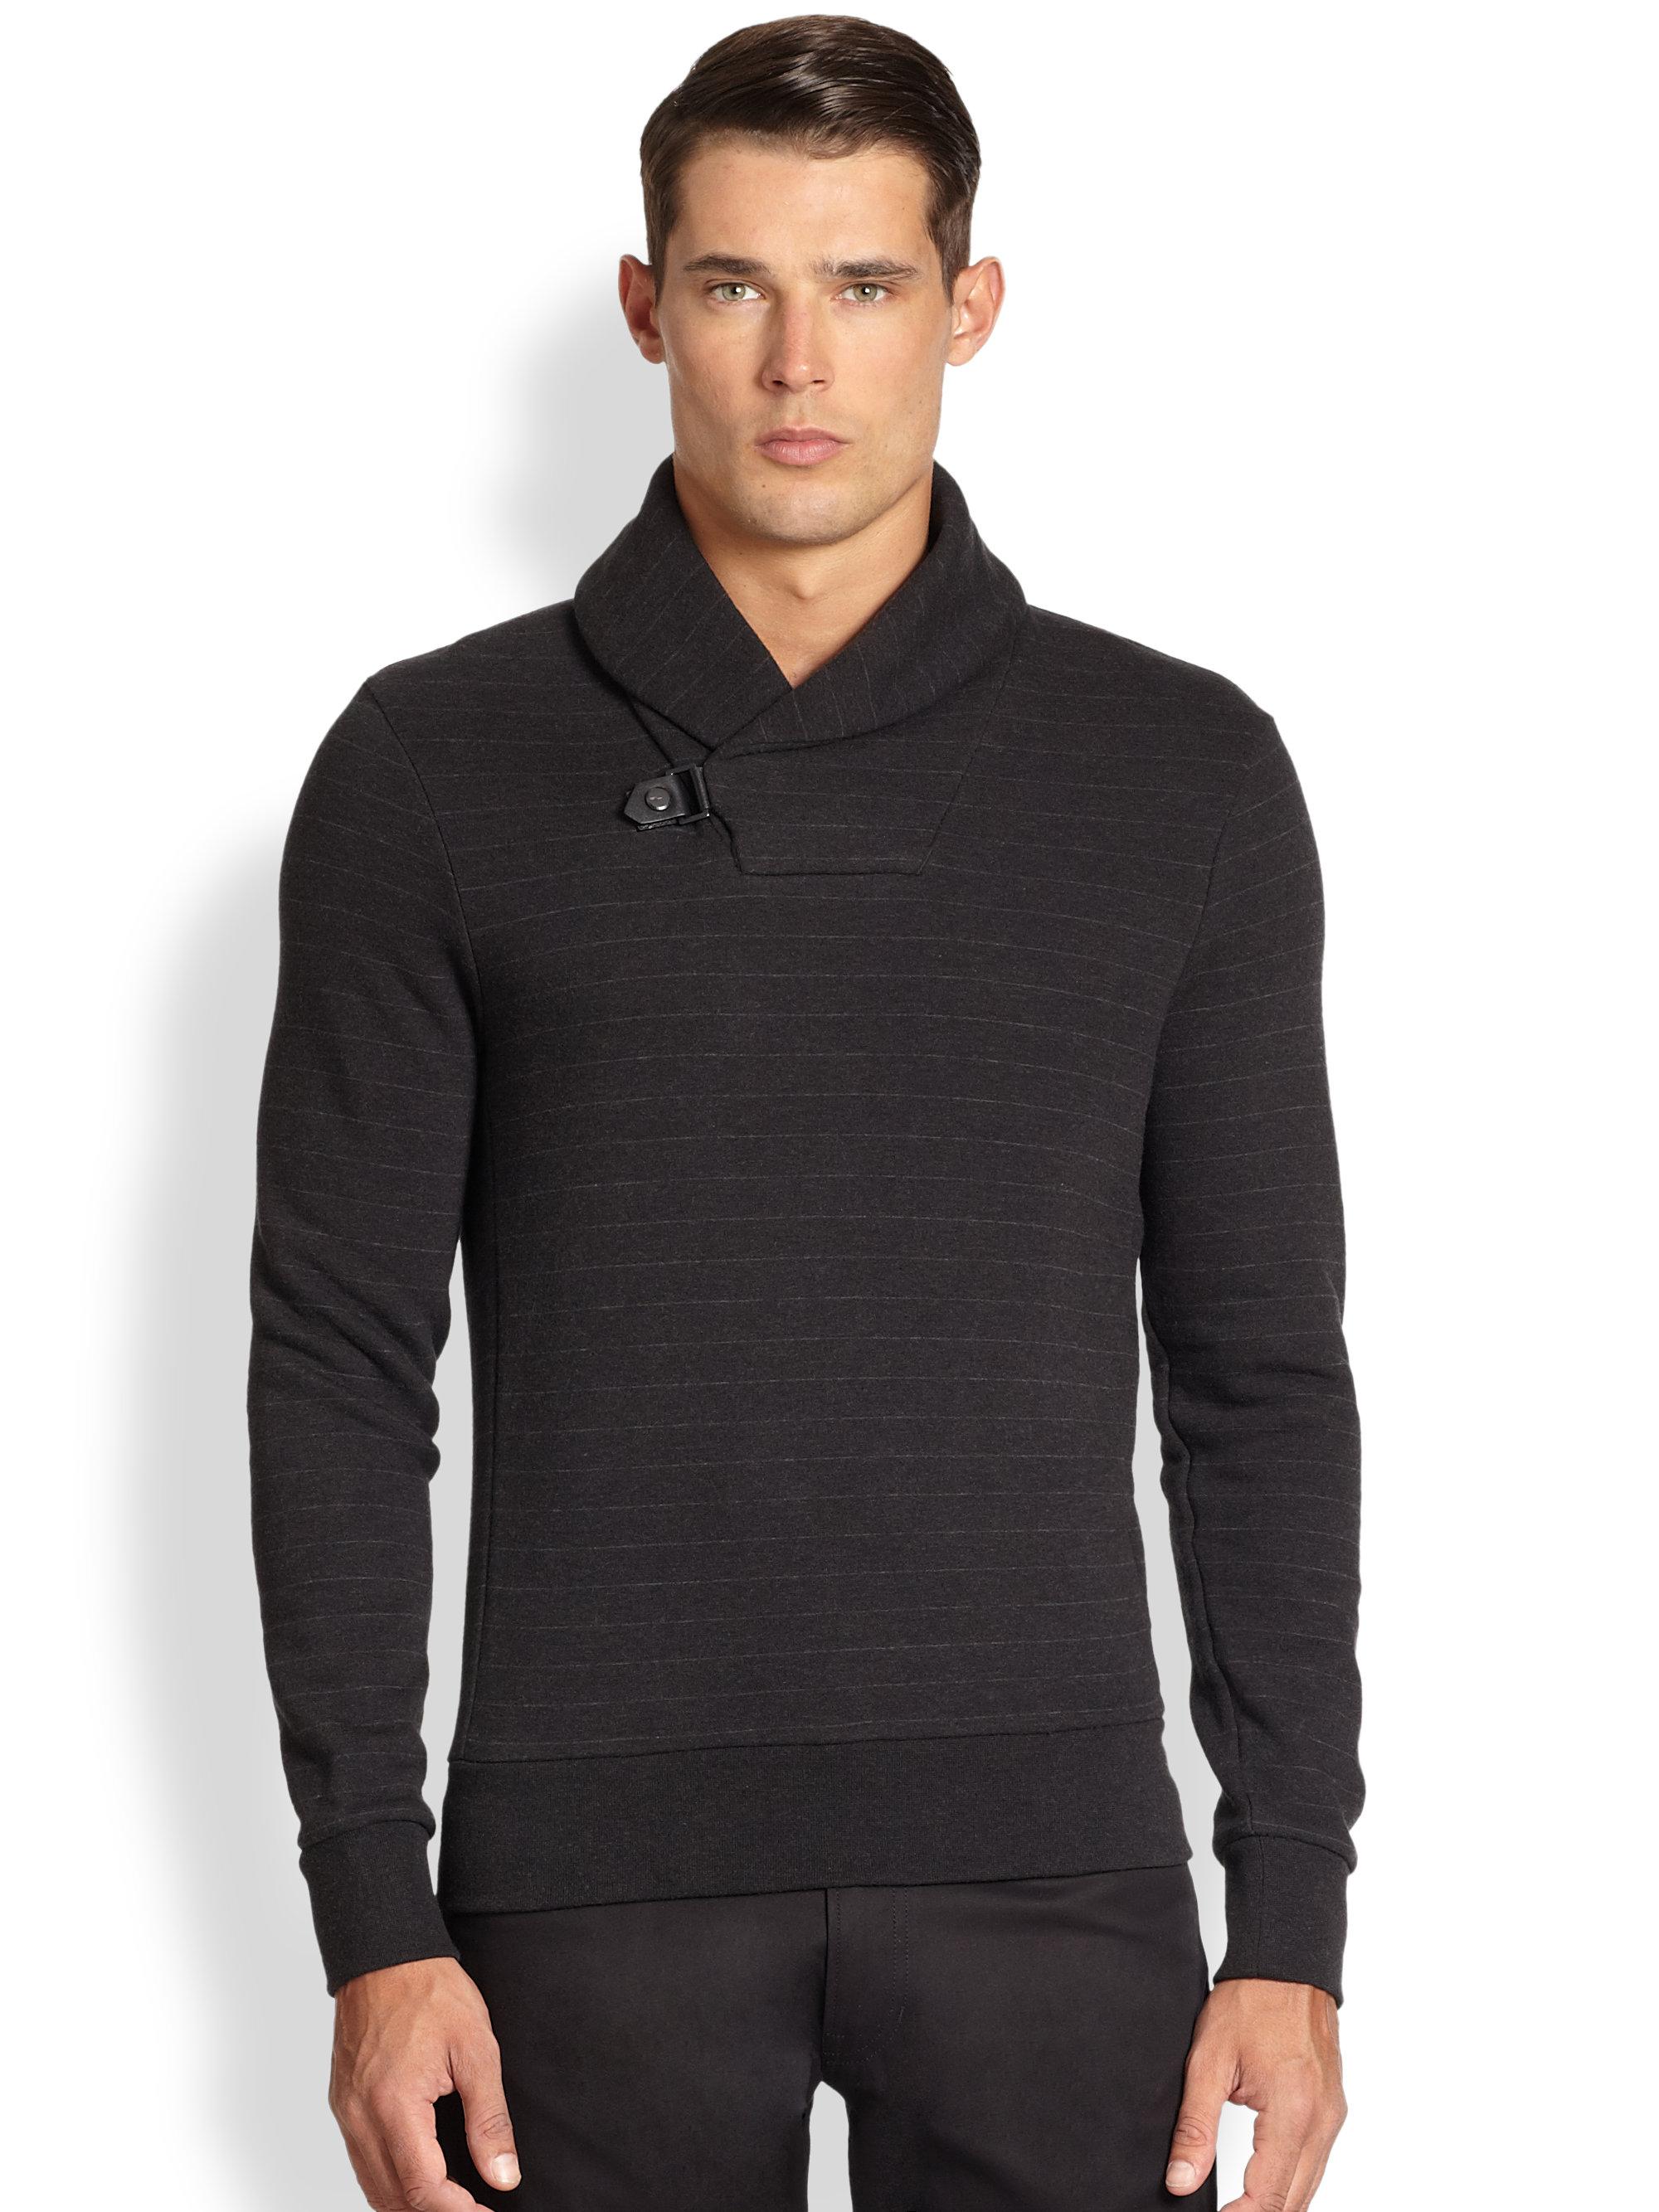 Ralph Lauren Fashion Show At New York: Ralph Lauren Black Label Shawl Collar Sweater In